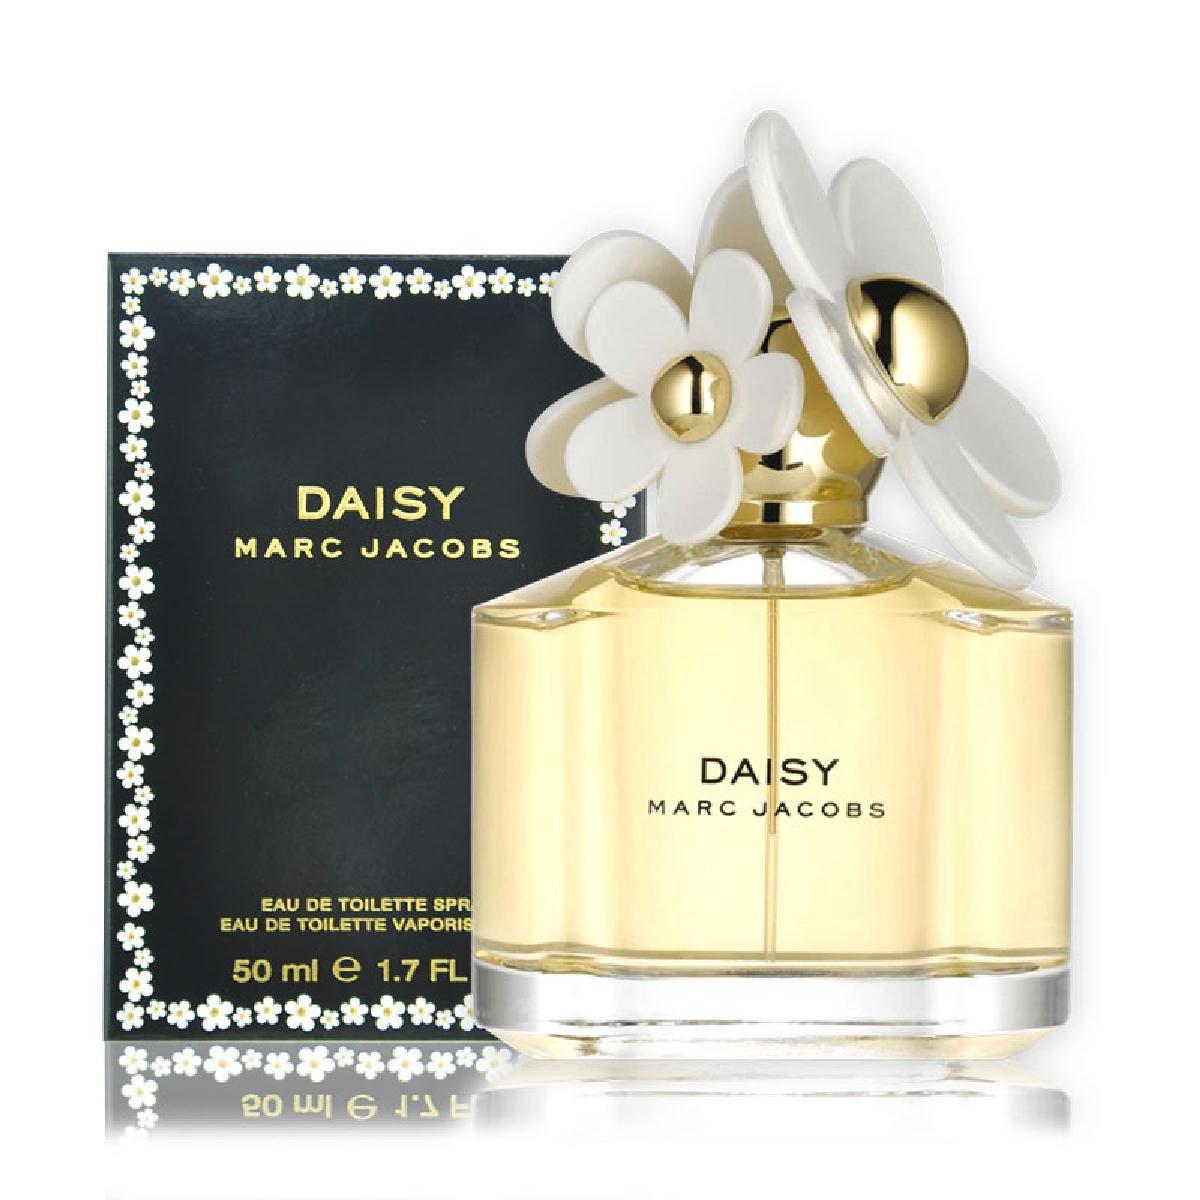 Daisy Perfume EDT Spray 50ml - [Parallel Import Product]